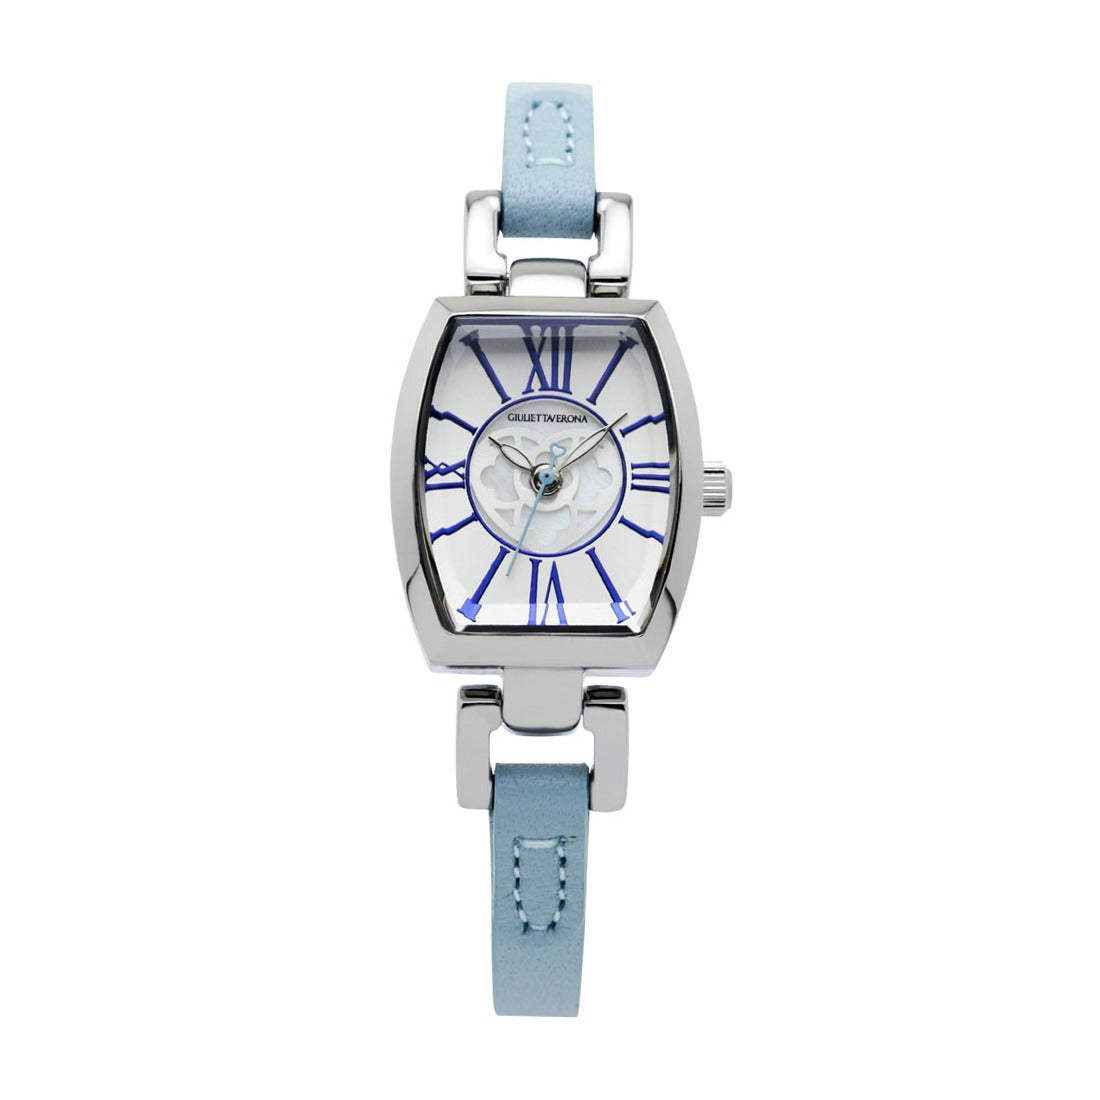 【SAC'S BAR】ジュリエッタヴェローナ GIULIETTAVERONA 腕時計 GV006 LOVE VERONA シルバー×ライトブルー